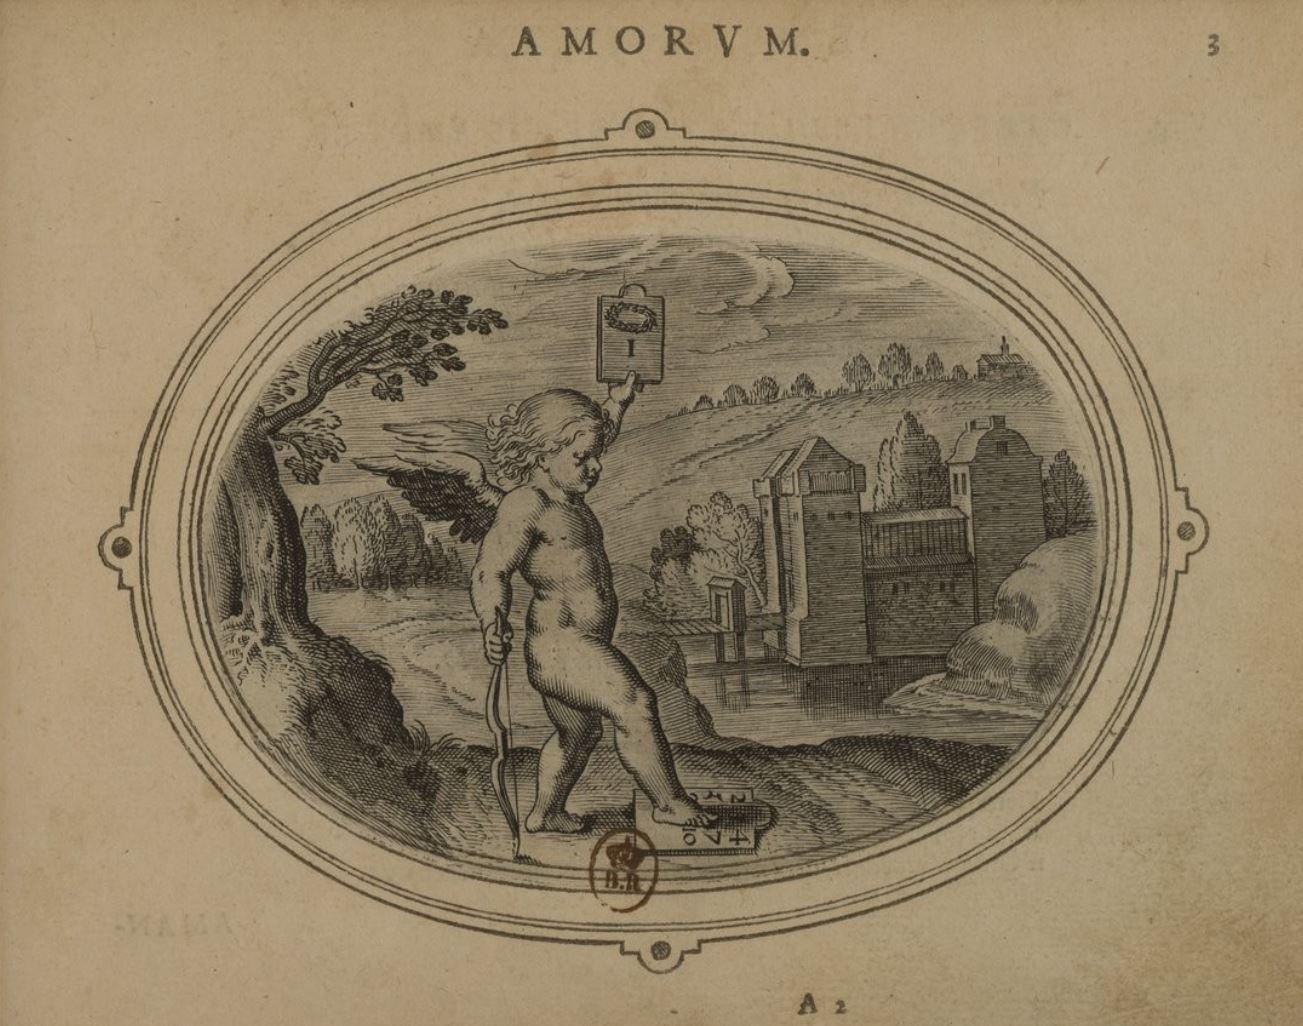 Otto Van Veen 1608 Amorum emblemata, figuris aeneis incisa, ve 23 Gallica